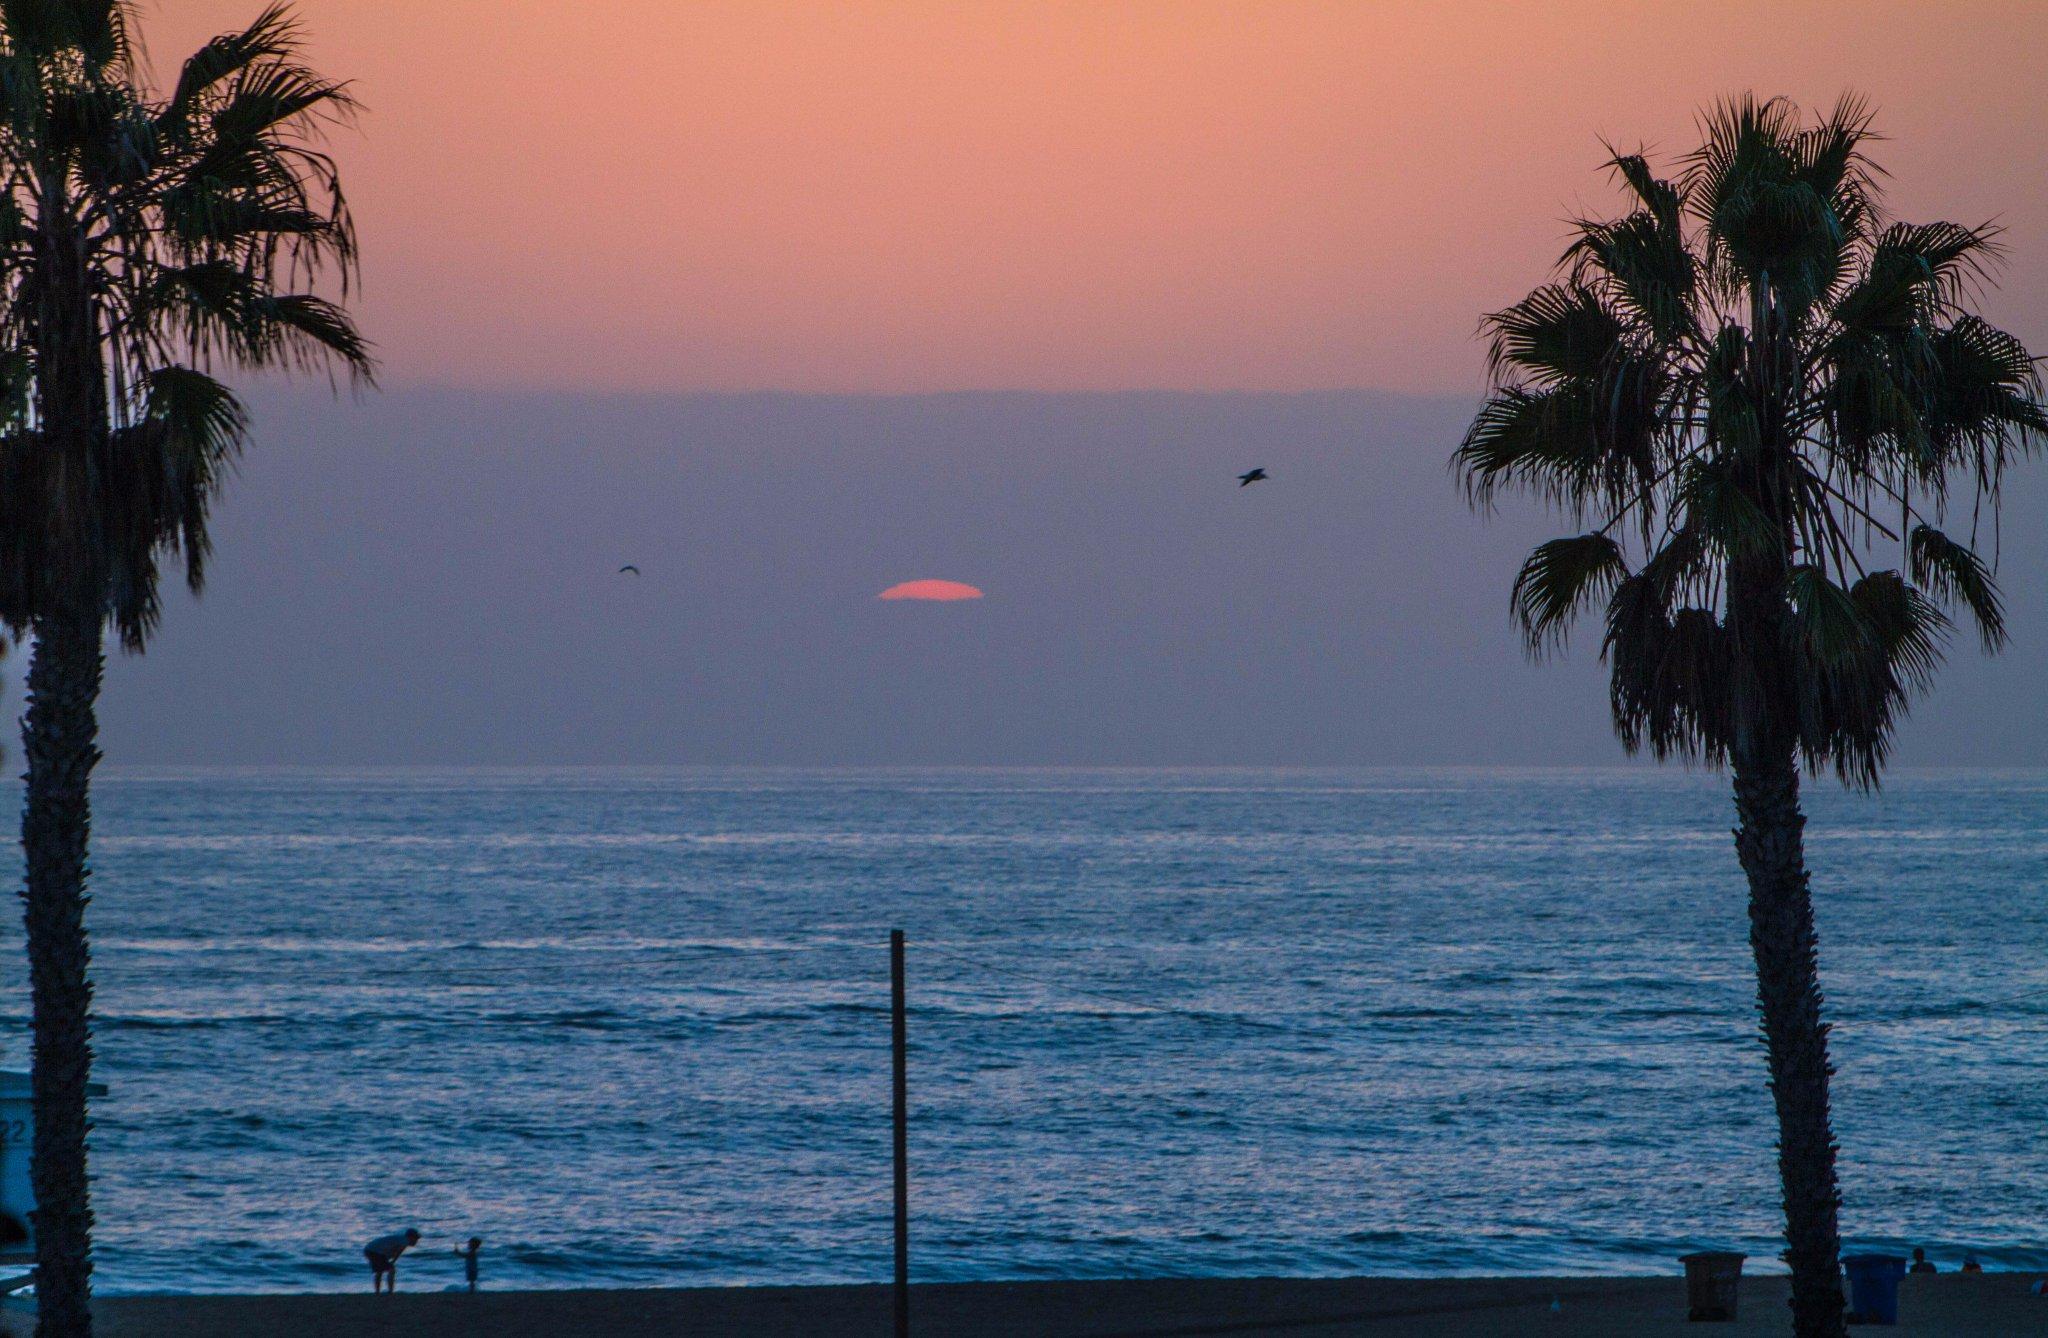 Weekend #sunset https://t.co/xN8RW4ULCU